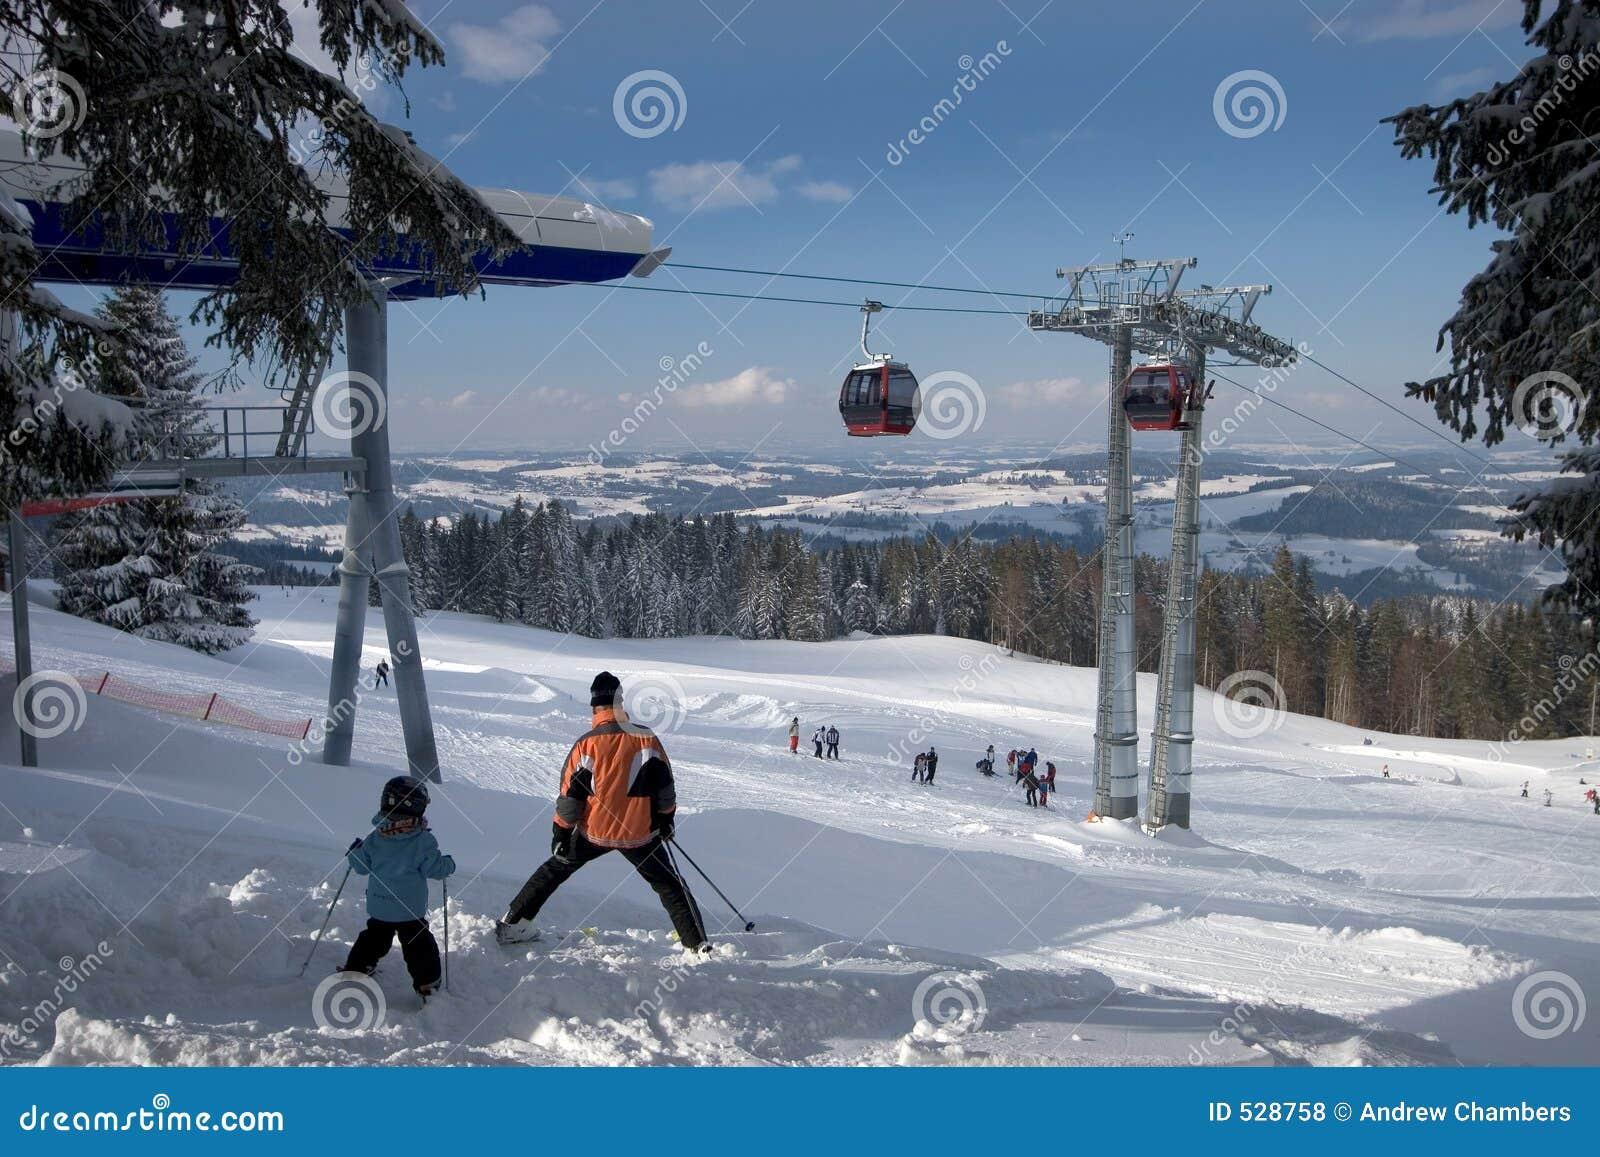 Download 高山滑雪 库存照片. 图片 包括有 修改, 多山, 冬天, 推力, 灰色, 系列, 汽车, 组塑, 瑞士, 滑雪 - 528758